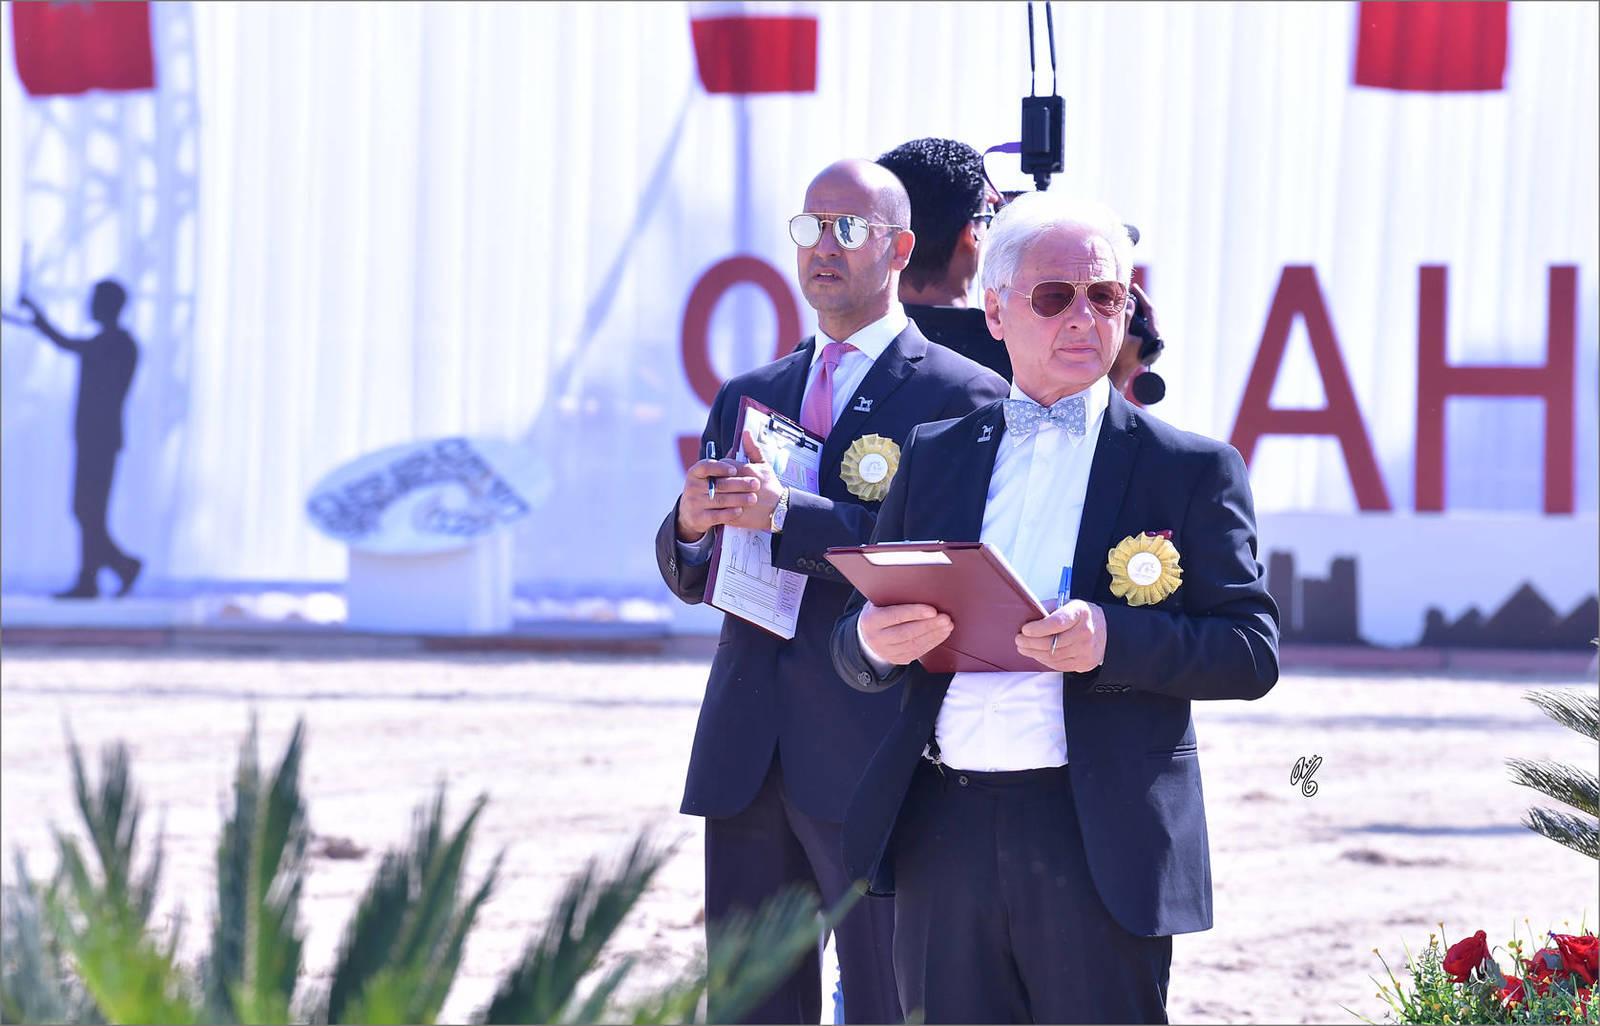 Judges Sufian Taha and Fausto Scanzi